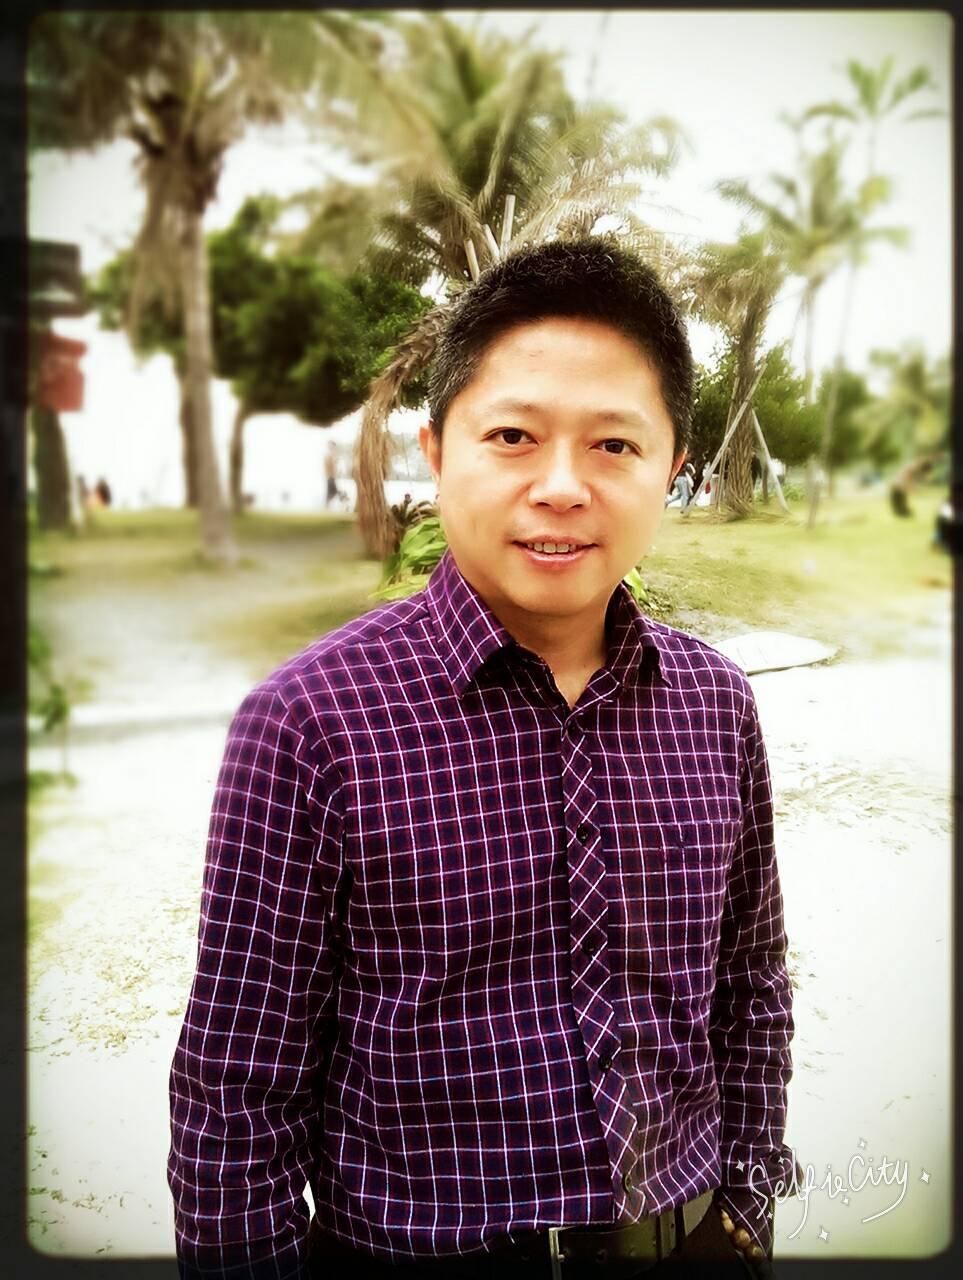 Kuo-Hung Hsiao